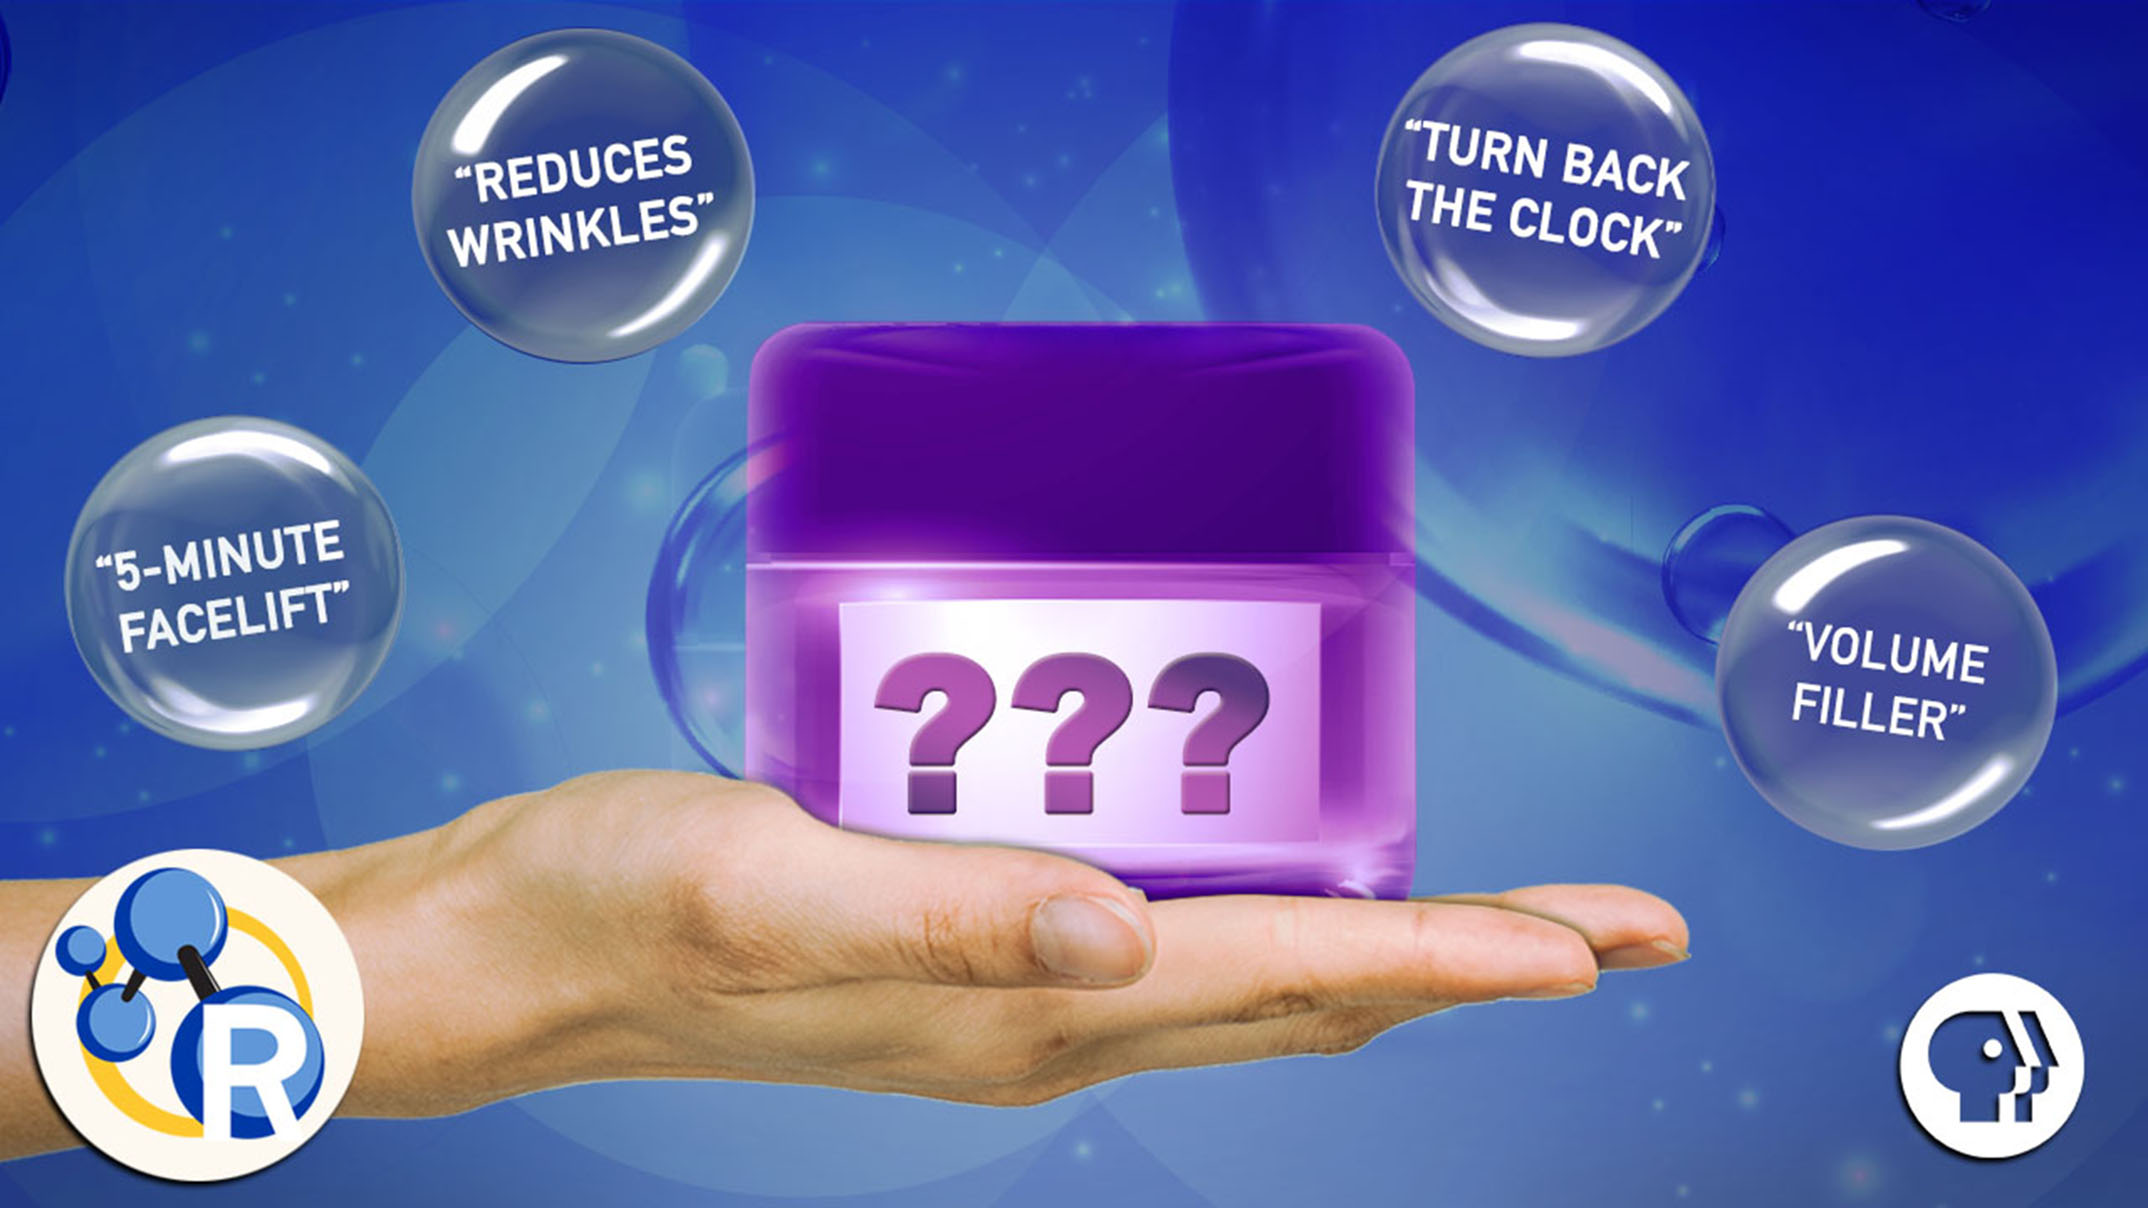 Do Anti-wrinkle Creams Work? (Video)